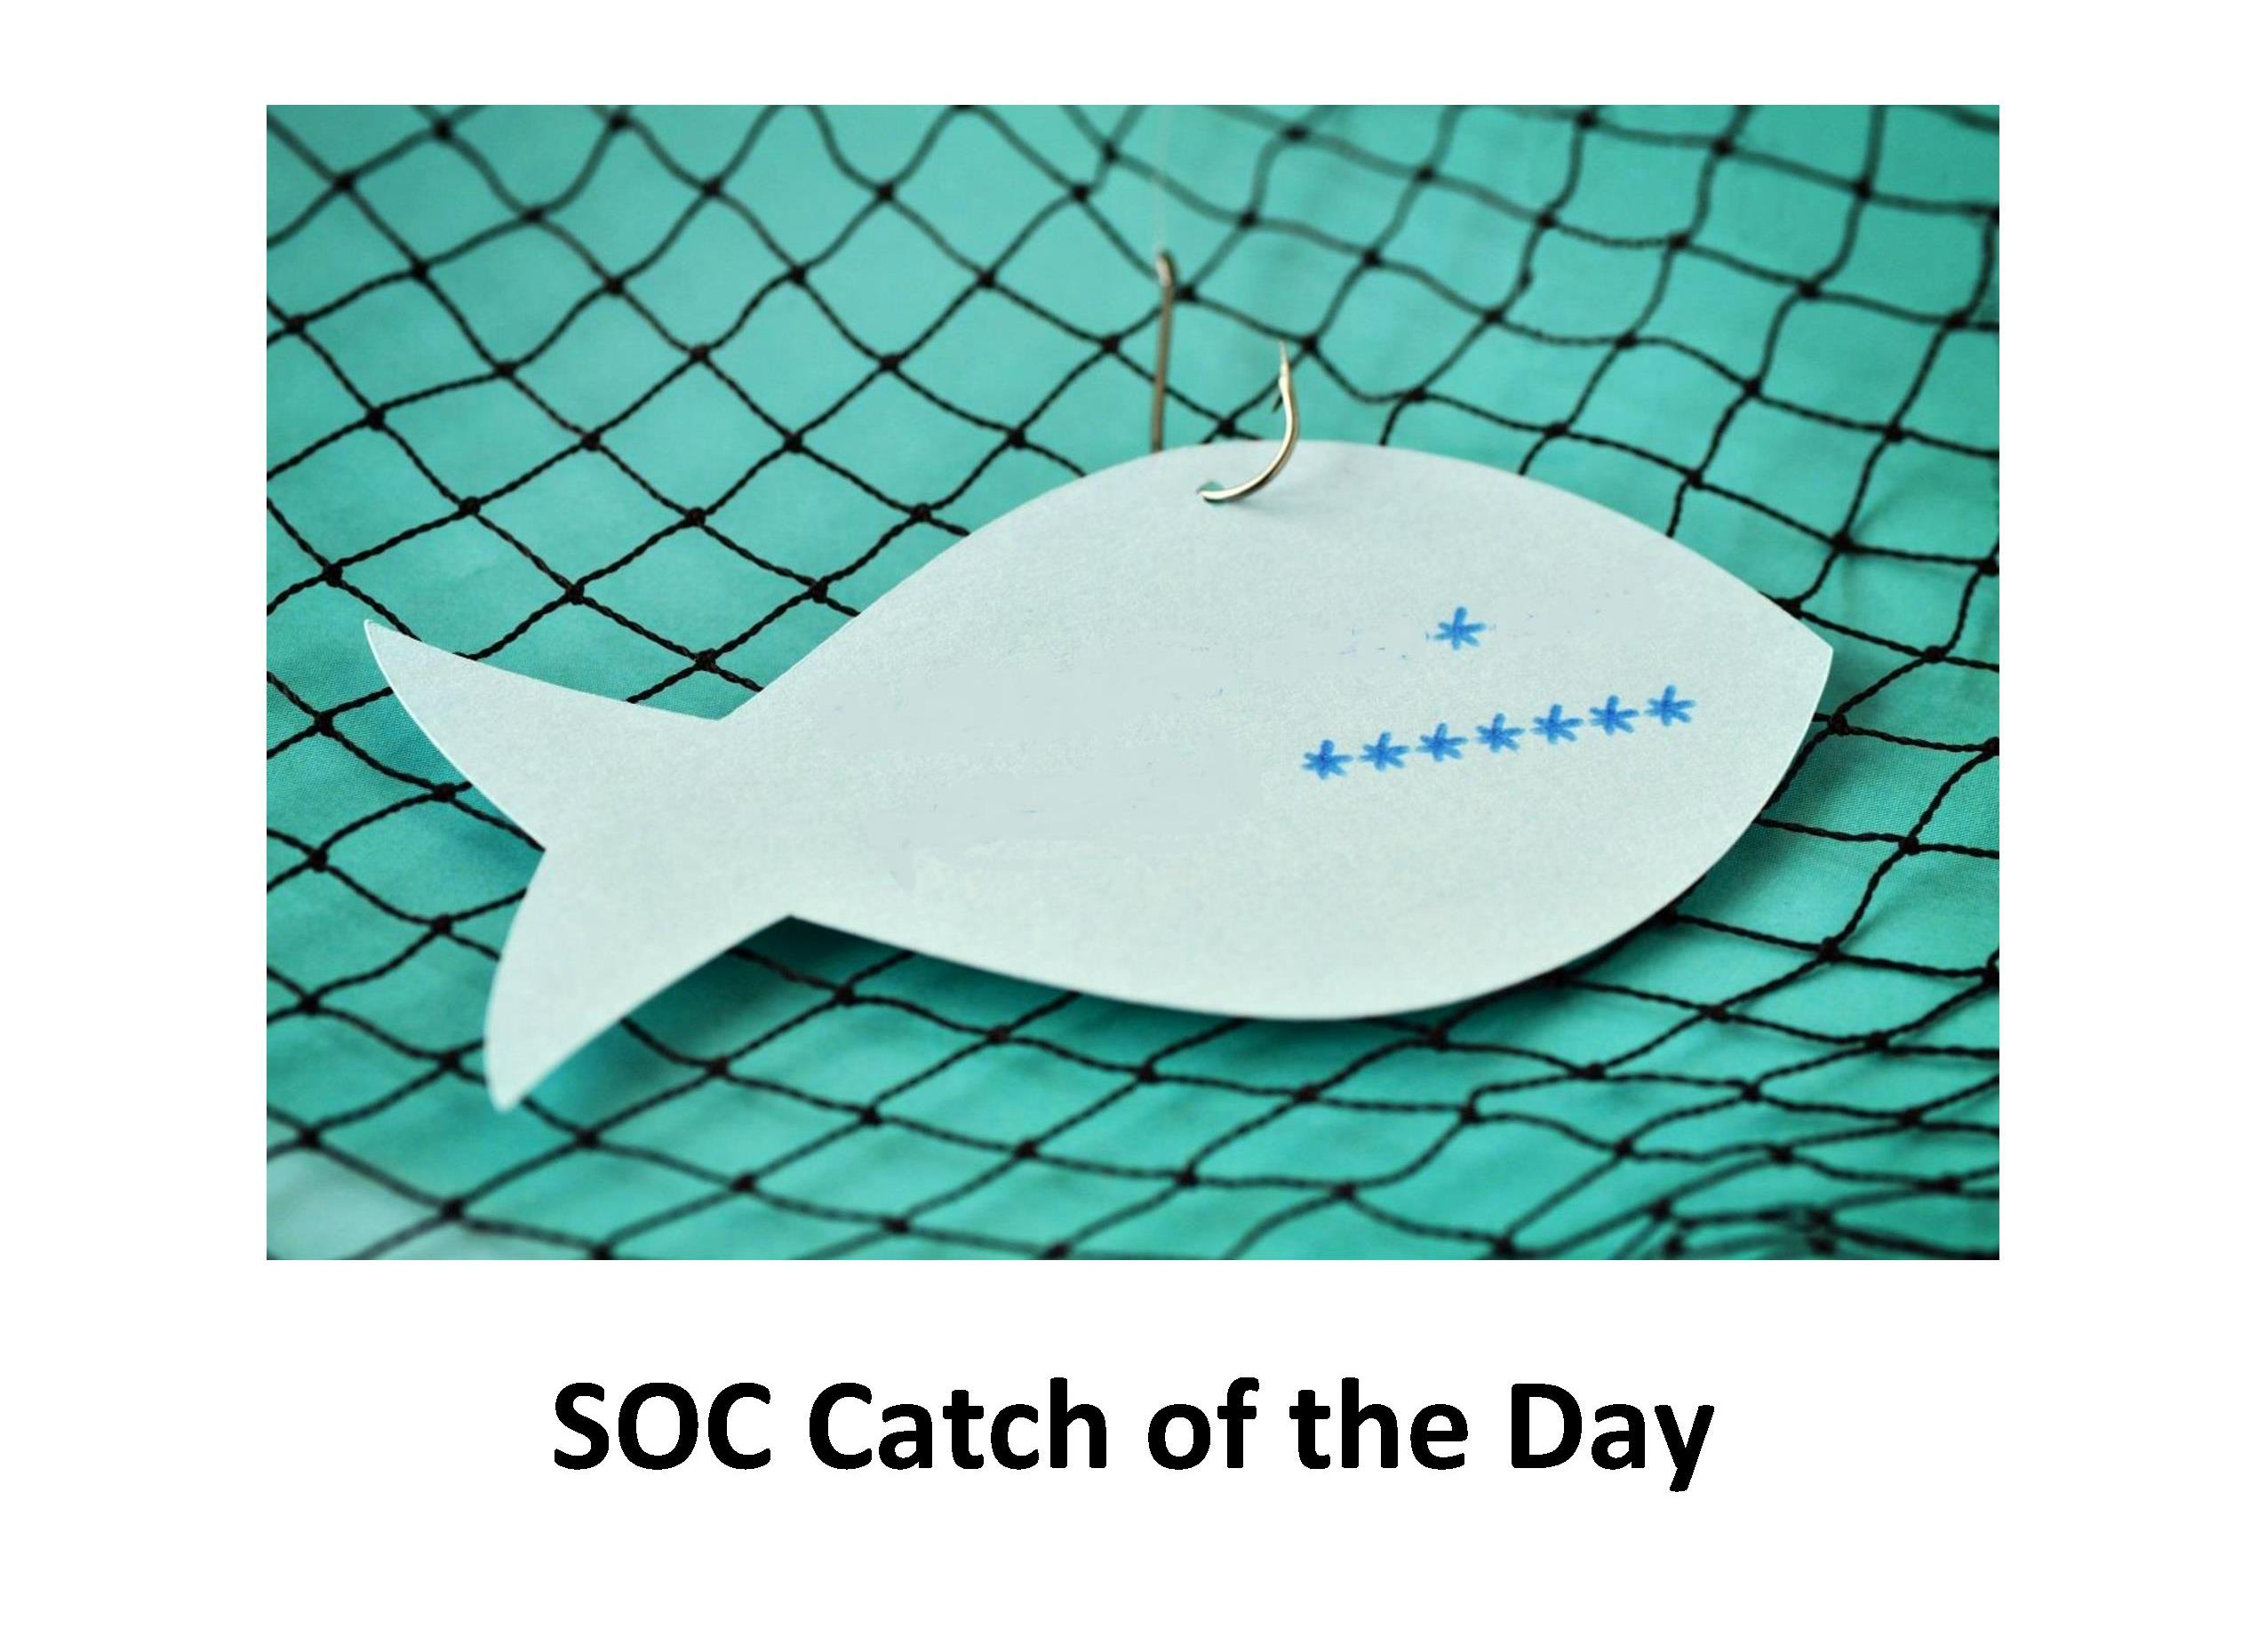 Netsurion SOC Catch of the Day